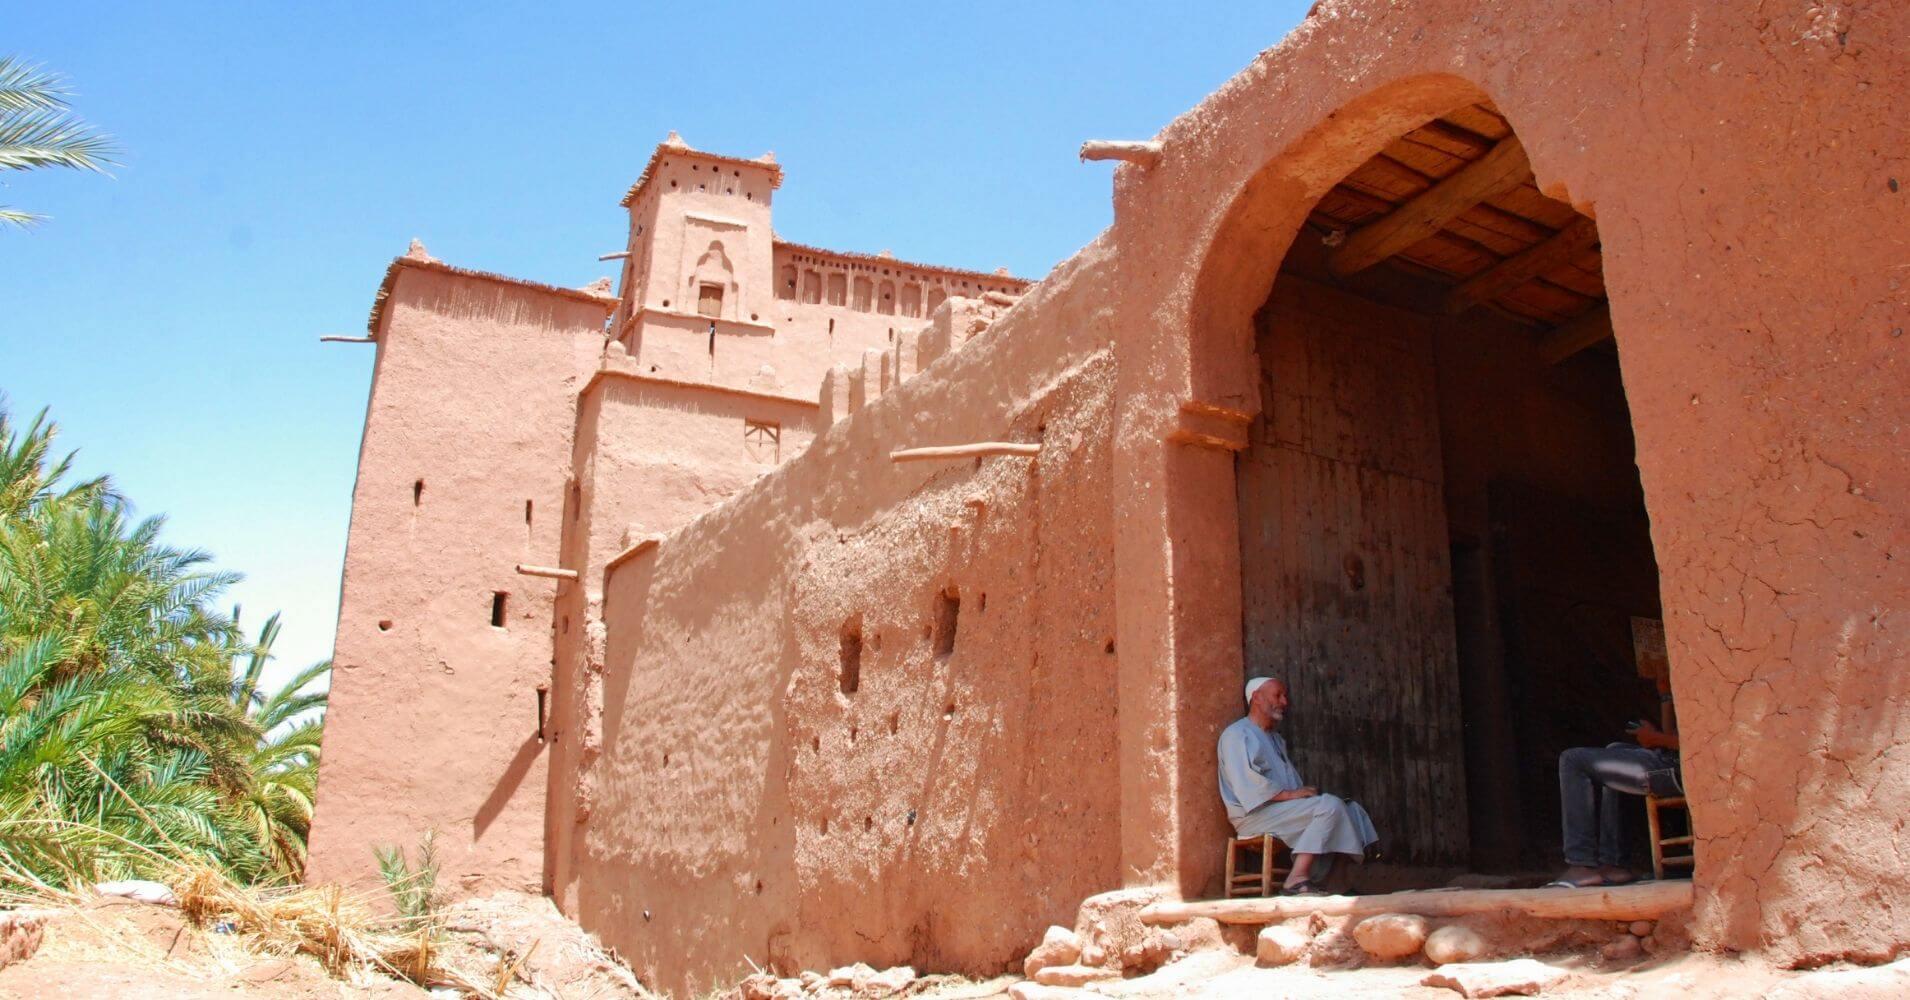 Entrada Kasbah de Aït Ben Haddou, Marruecos.